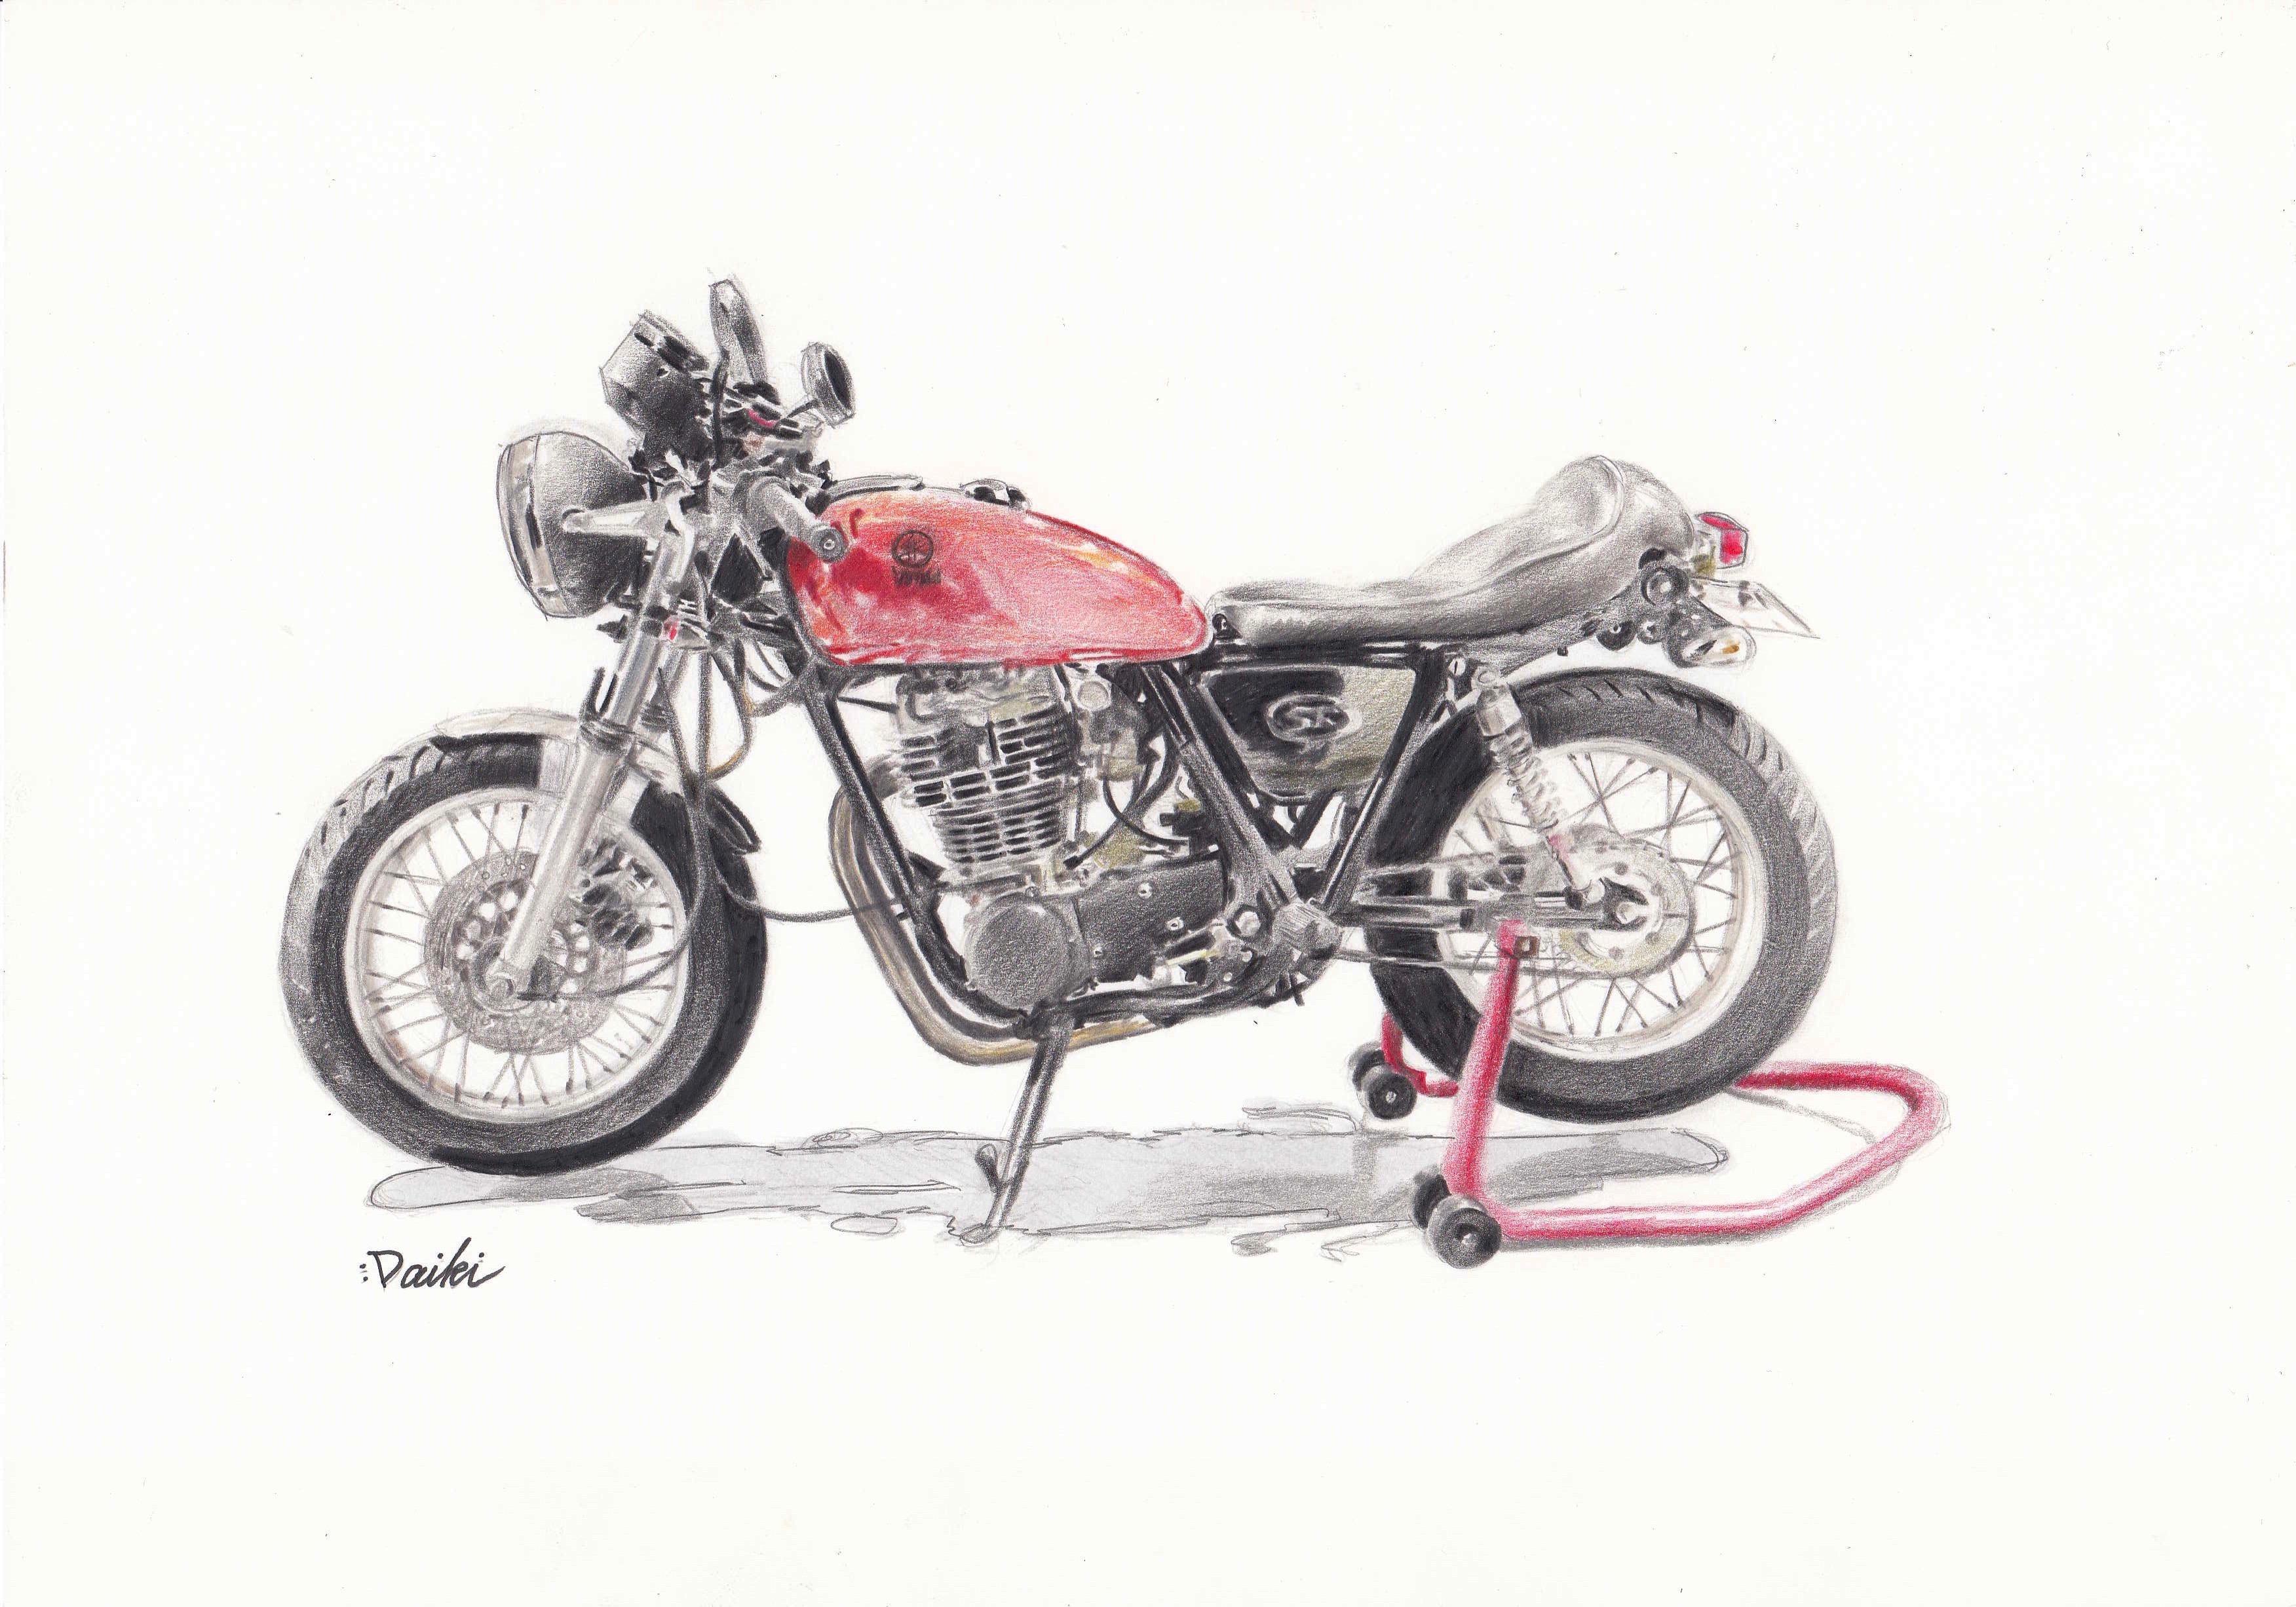 YAMAHA SR400 色鉛筆イラスト